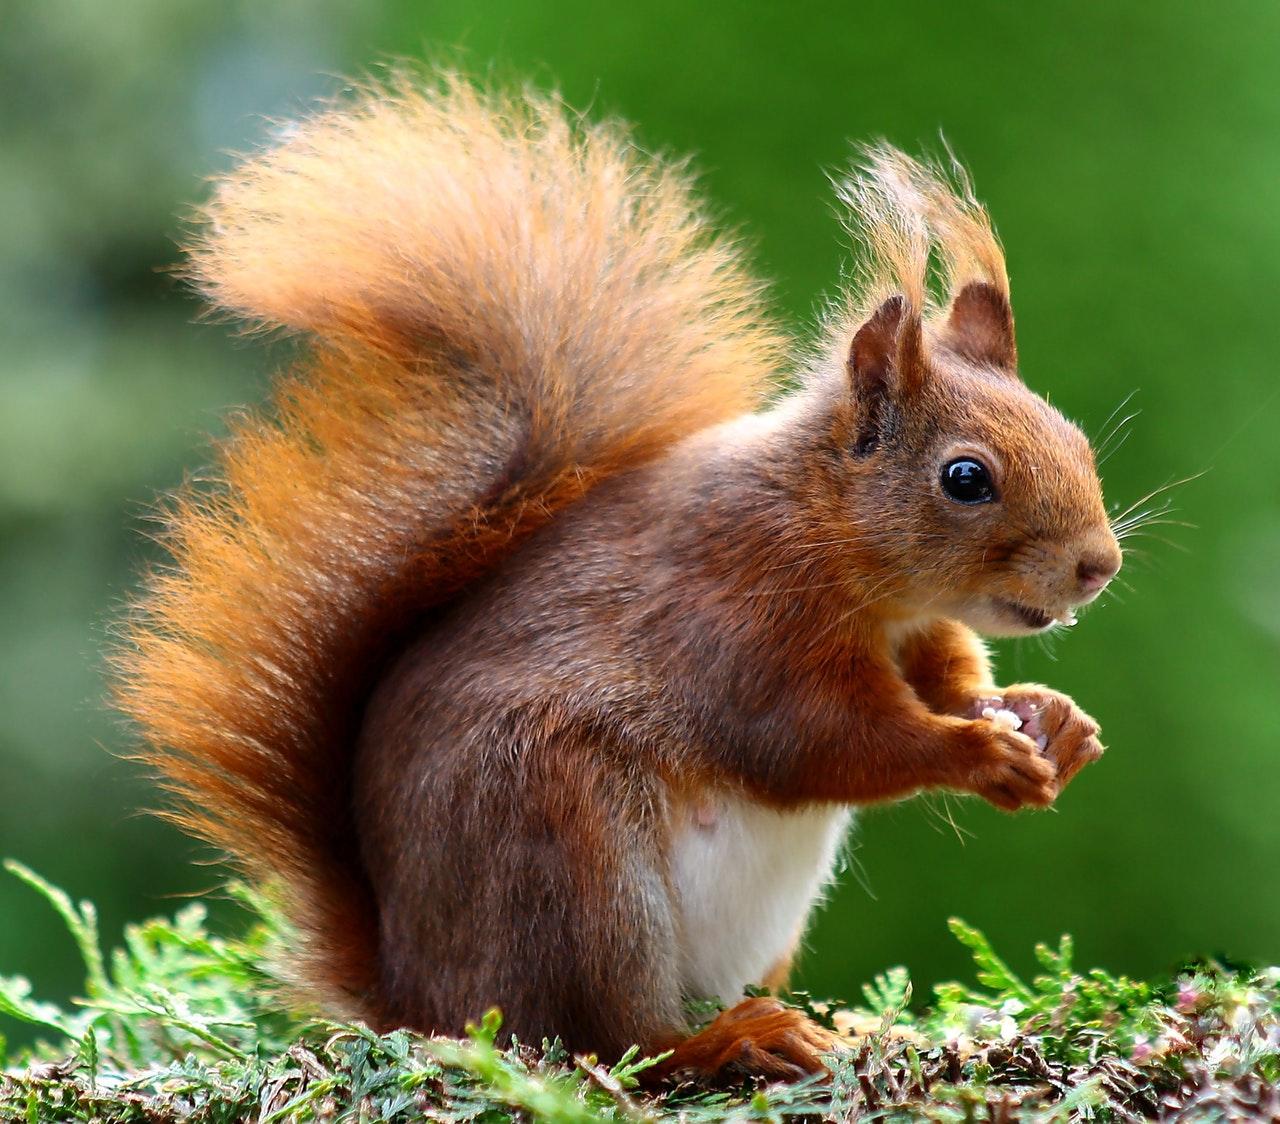 squirrel www.atozmomm.com